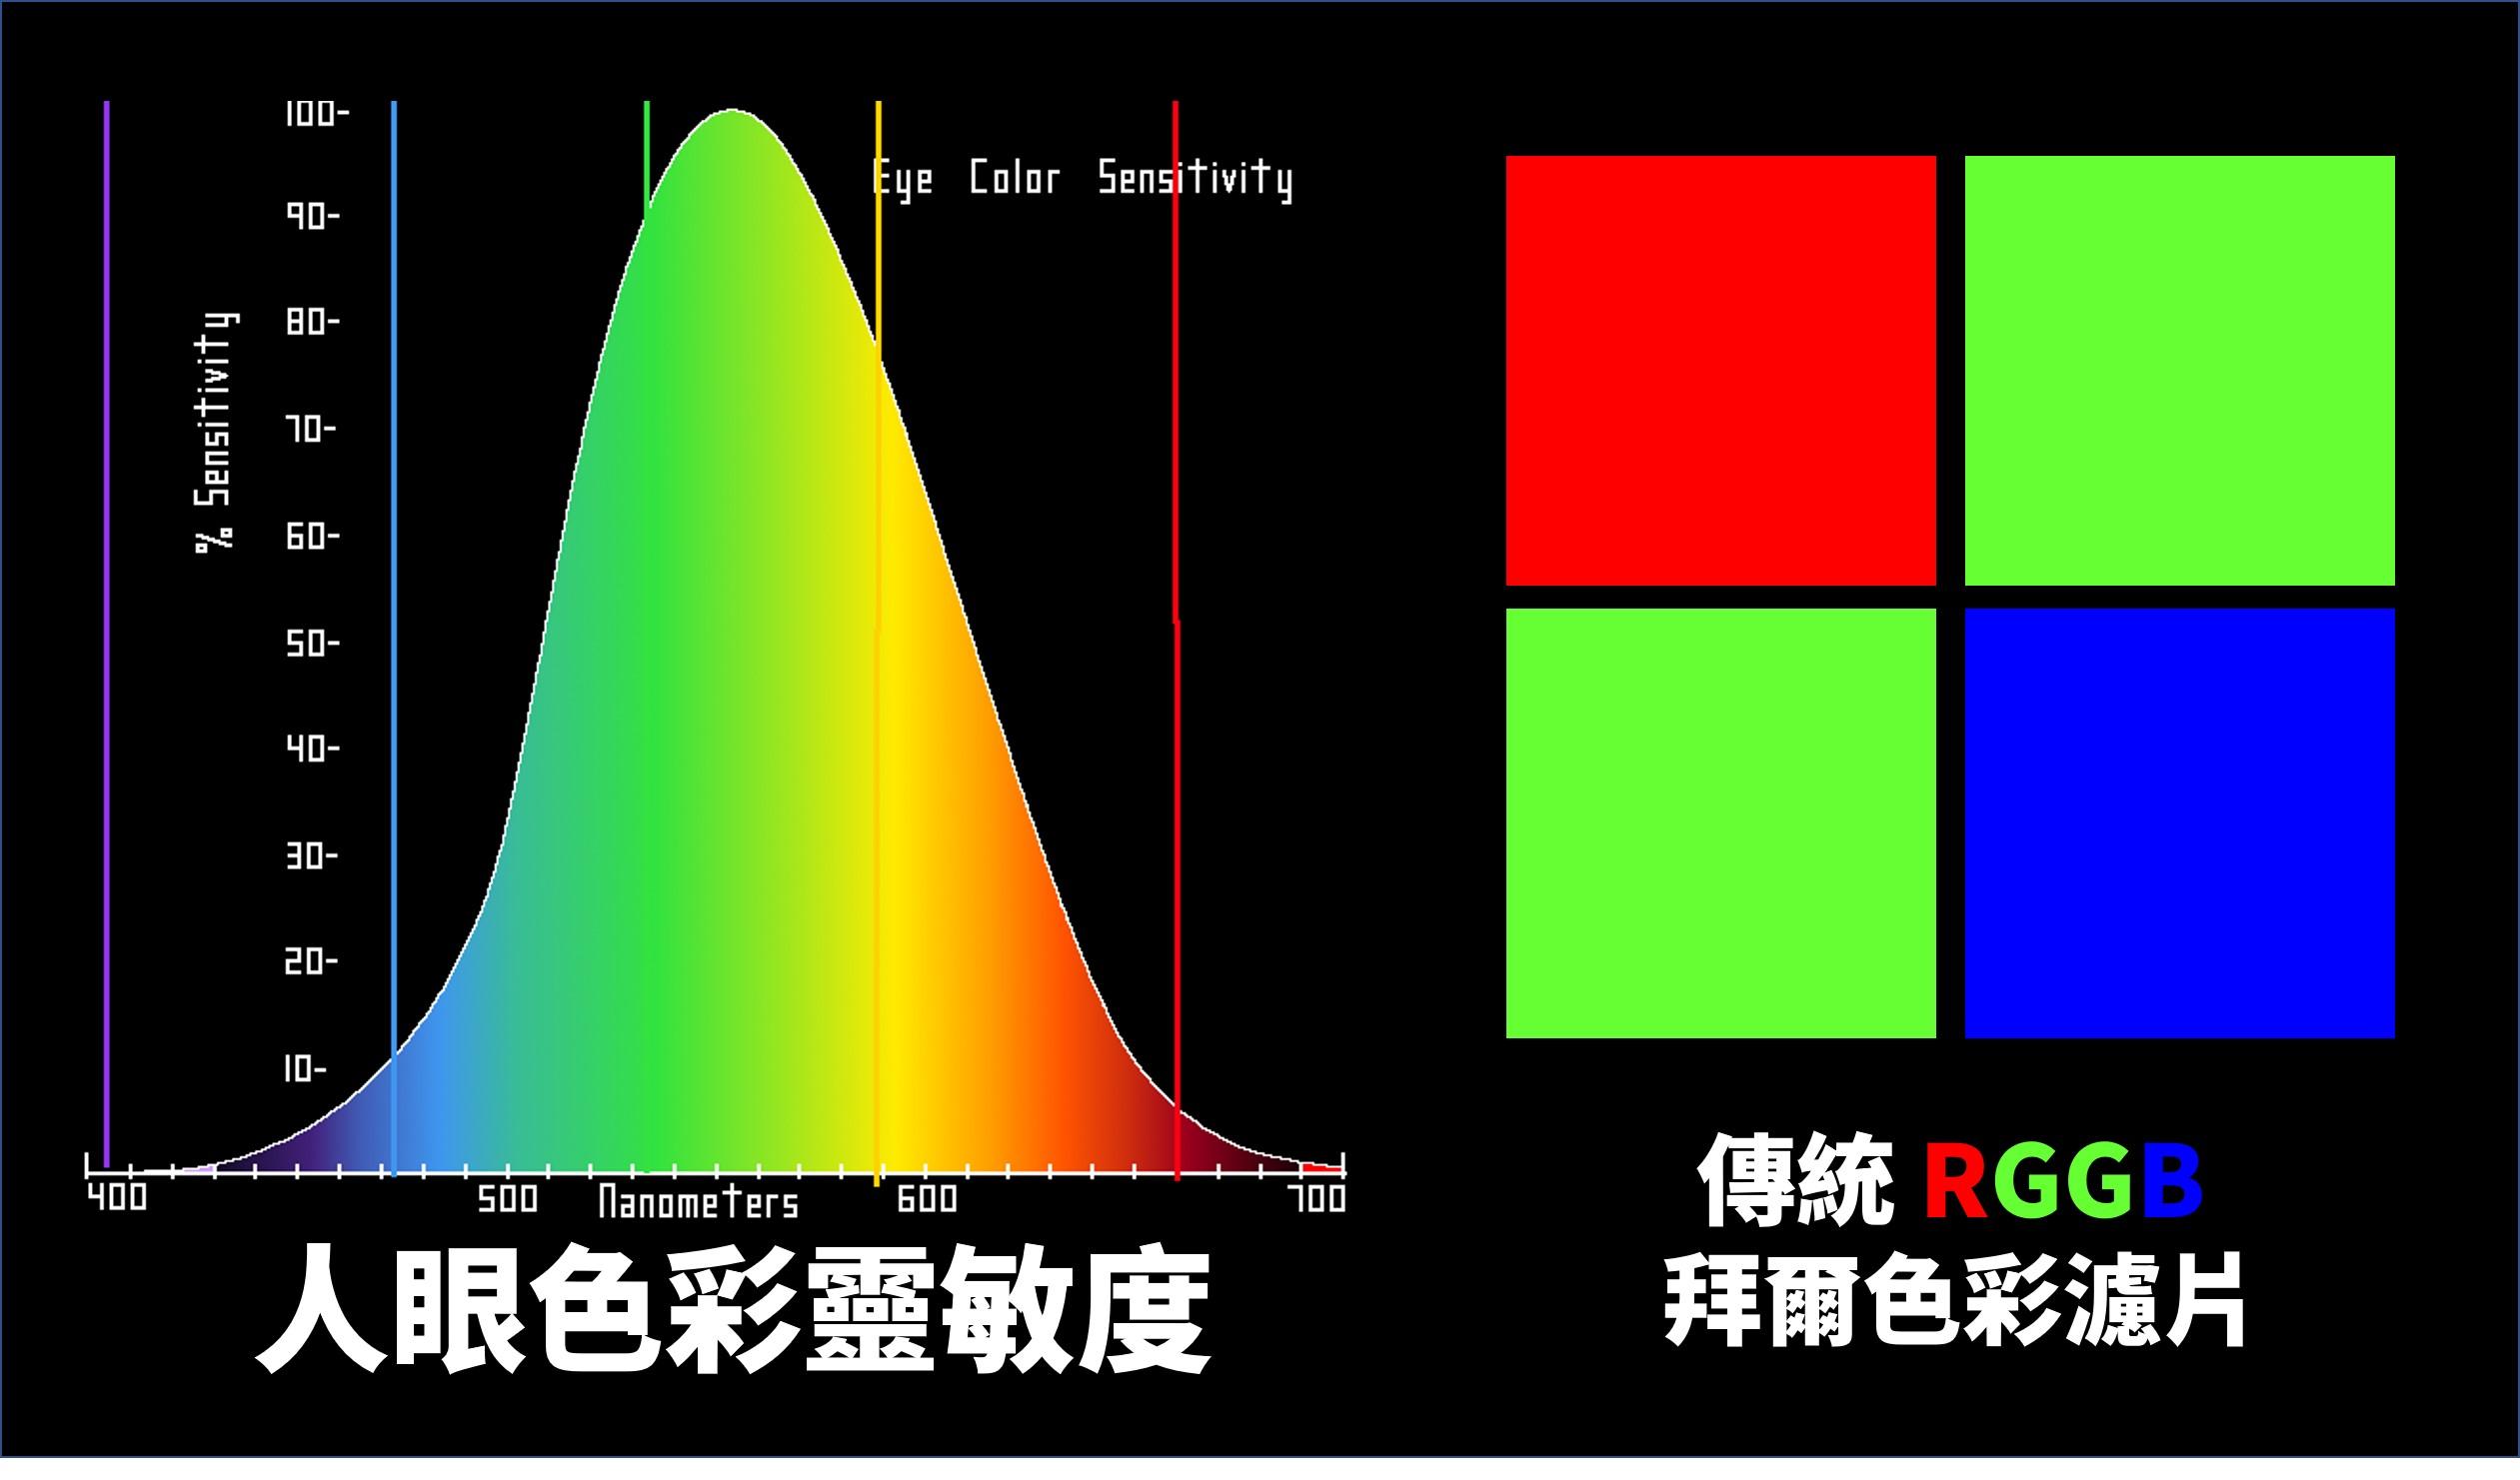 RGGB 色彩濾鏡